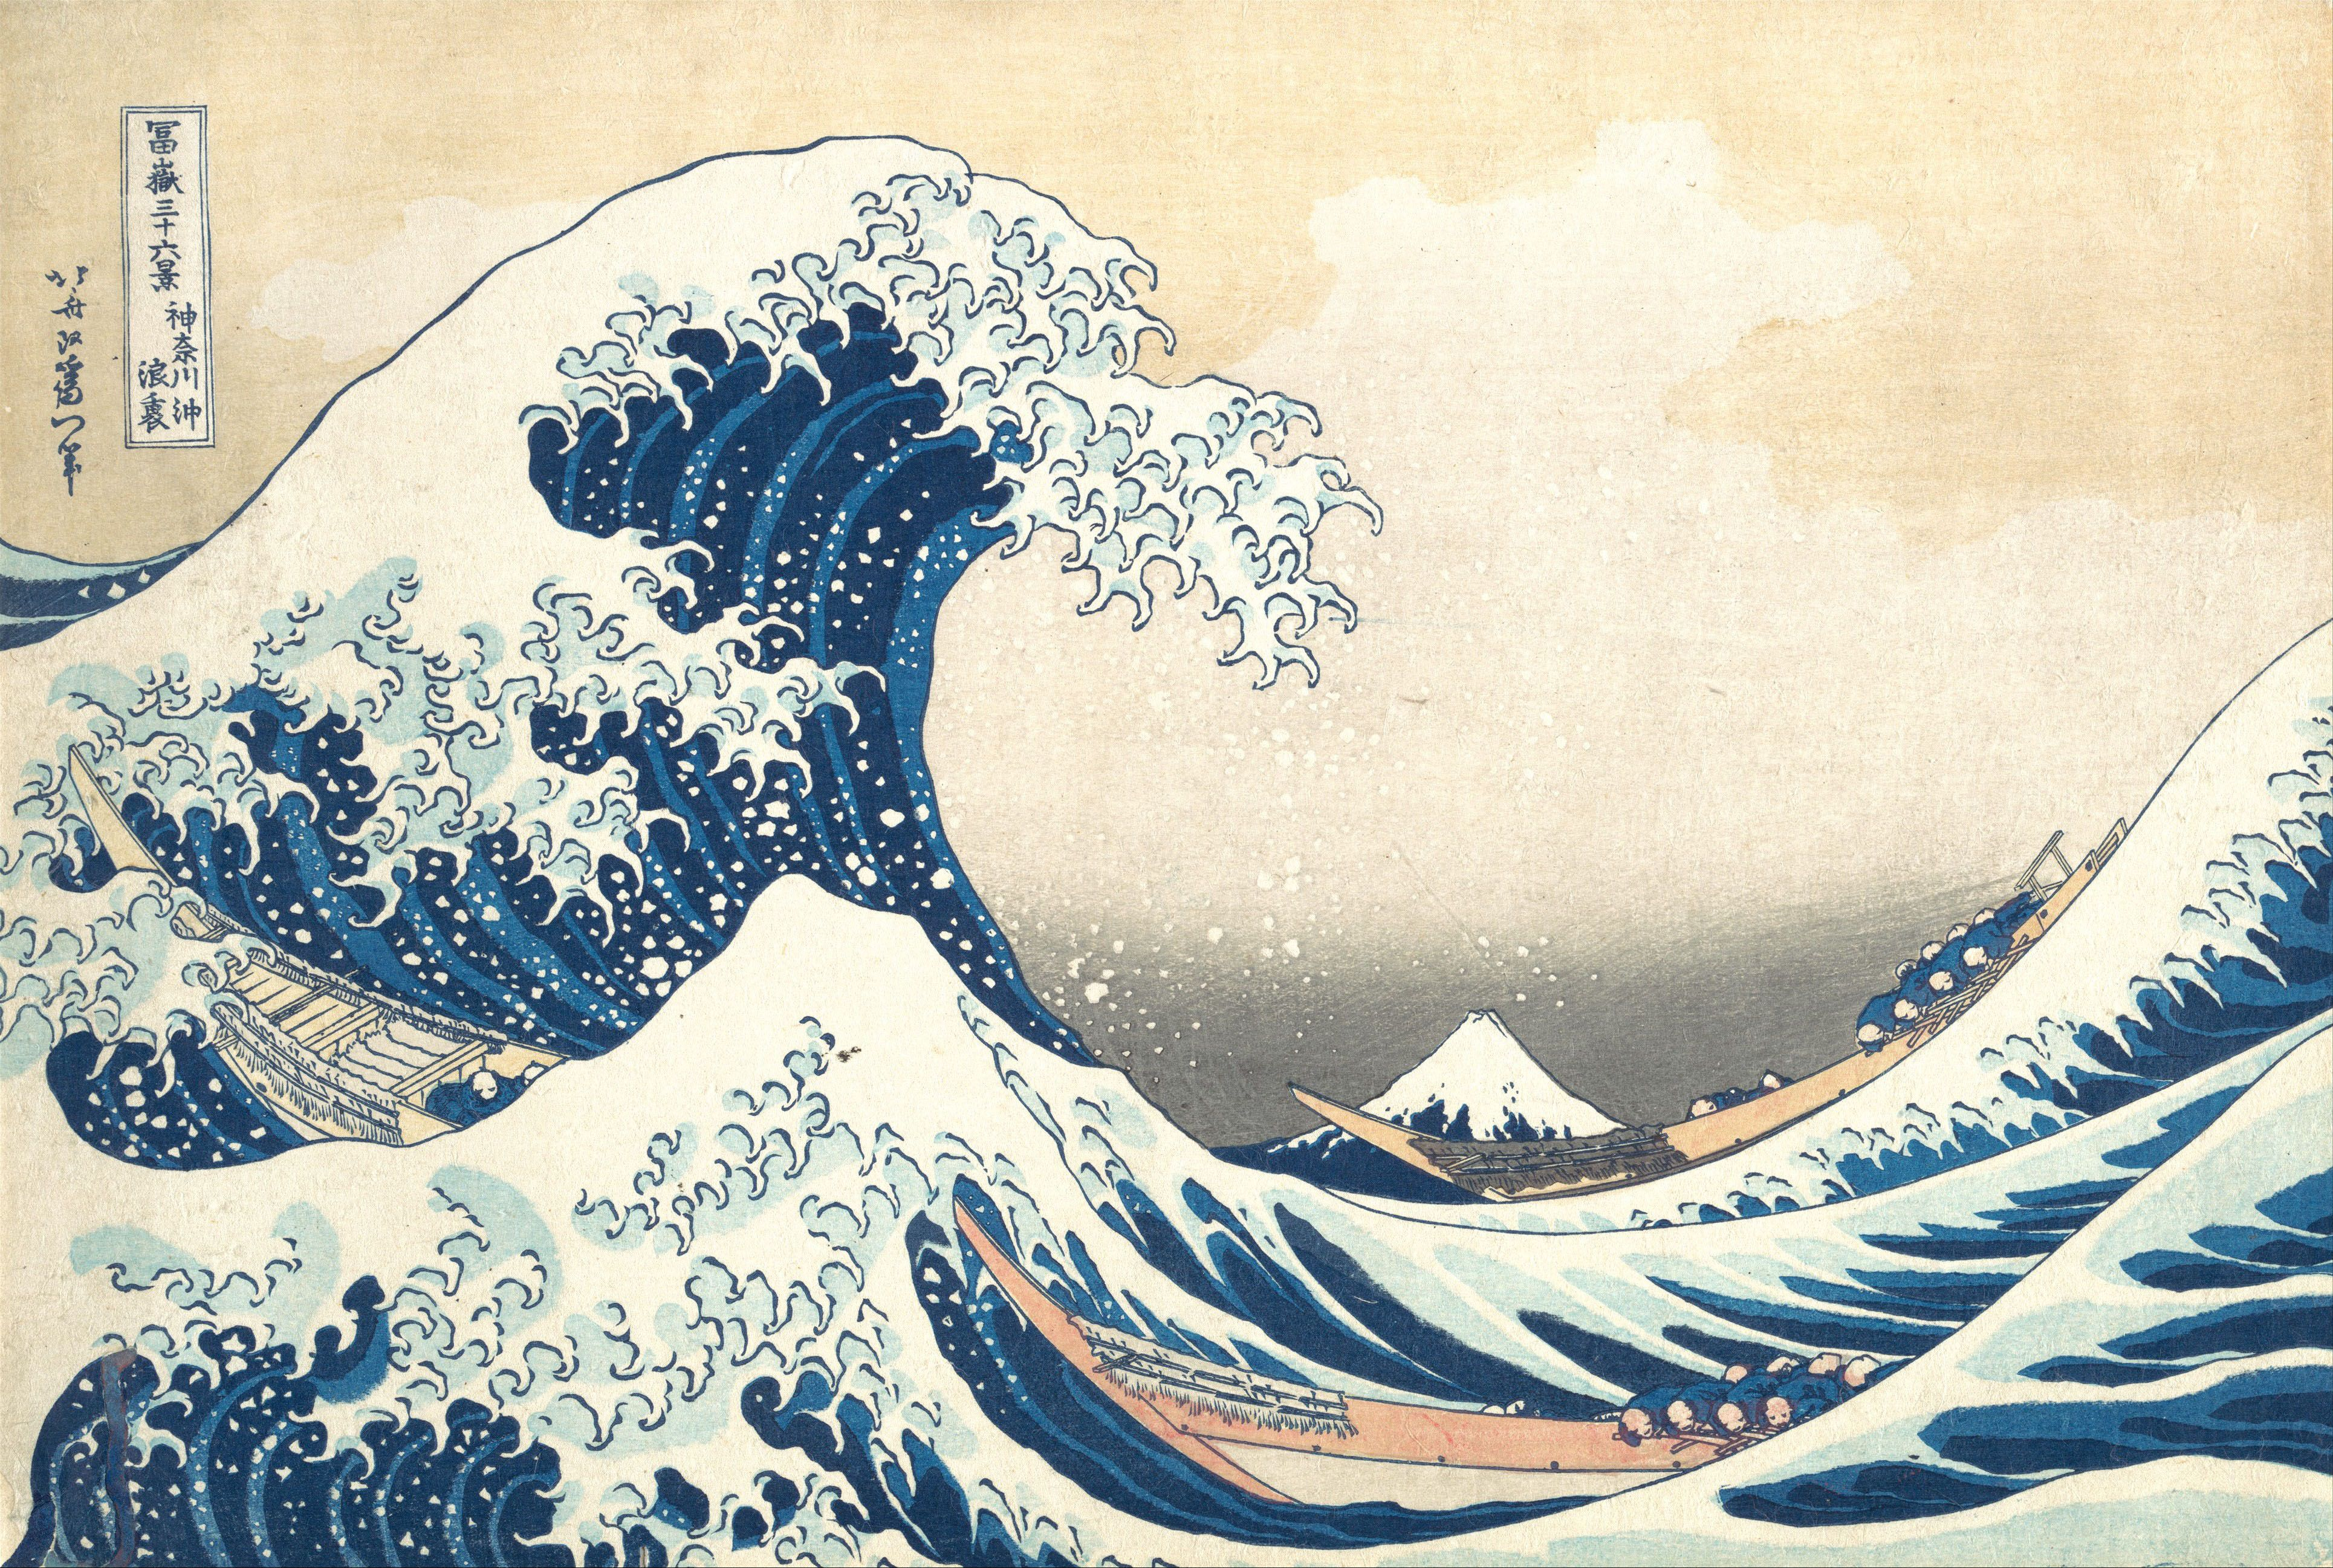 Tsunami_by_hokusai_19th_century (2)